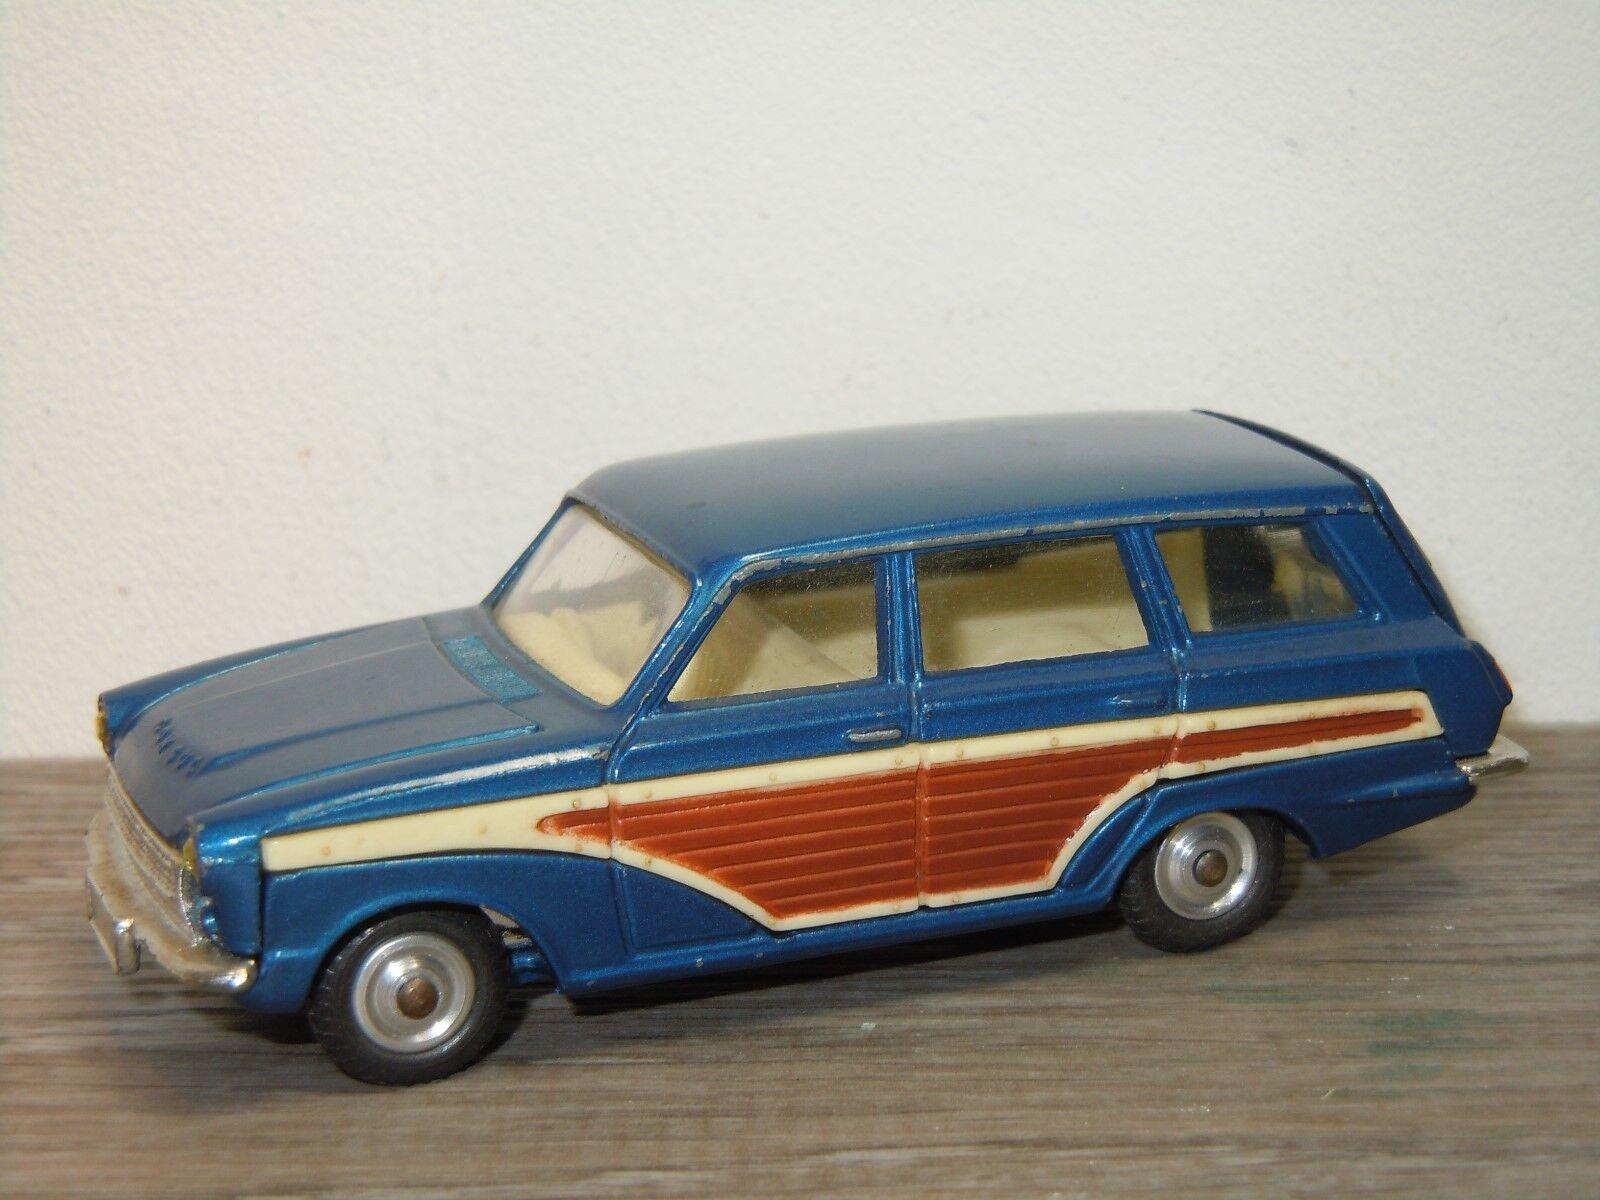 Ford Consul Cortina Super Estate Car - Corgi Toys England 34406